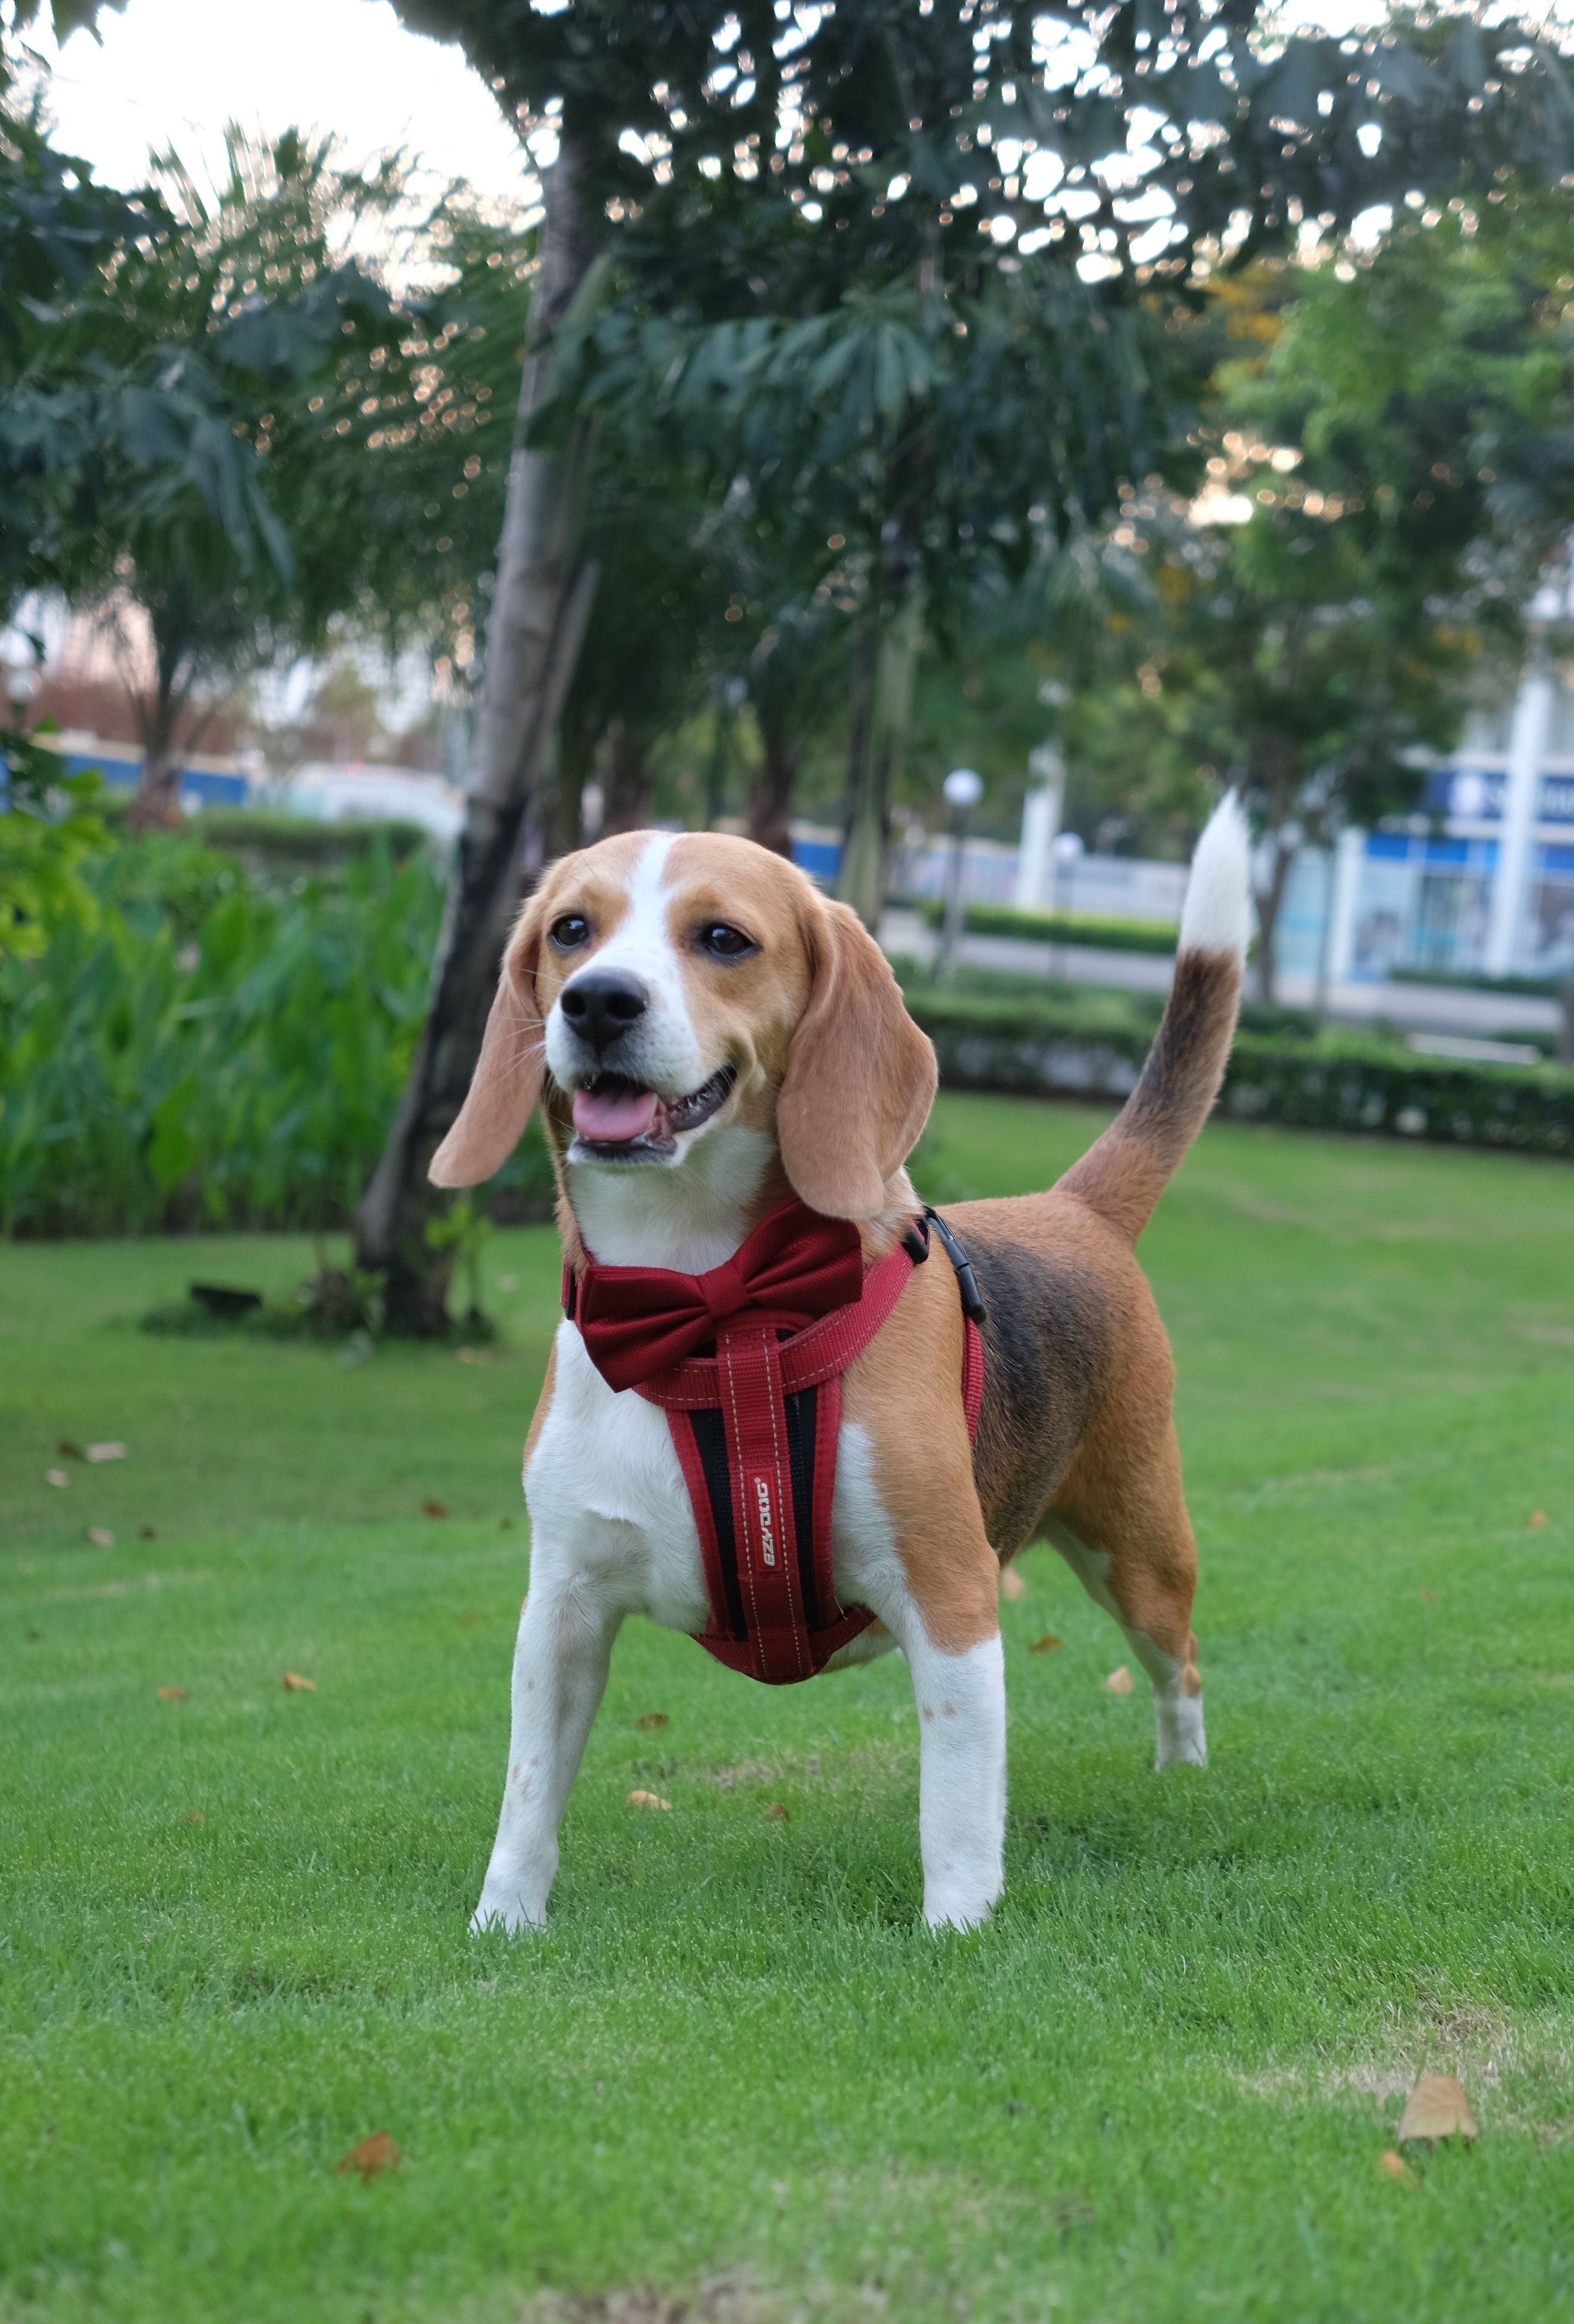 Pin By Yen Nguyen On My Lovely Beagle Beagle Breeds Pets Puppies